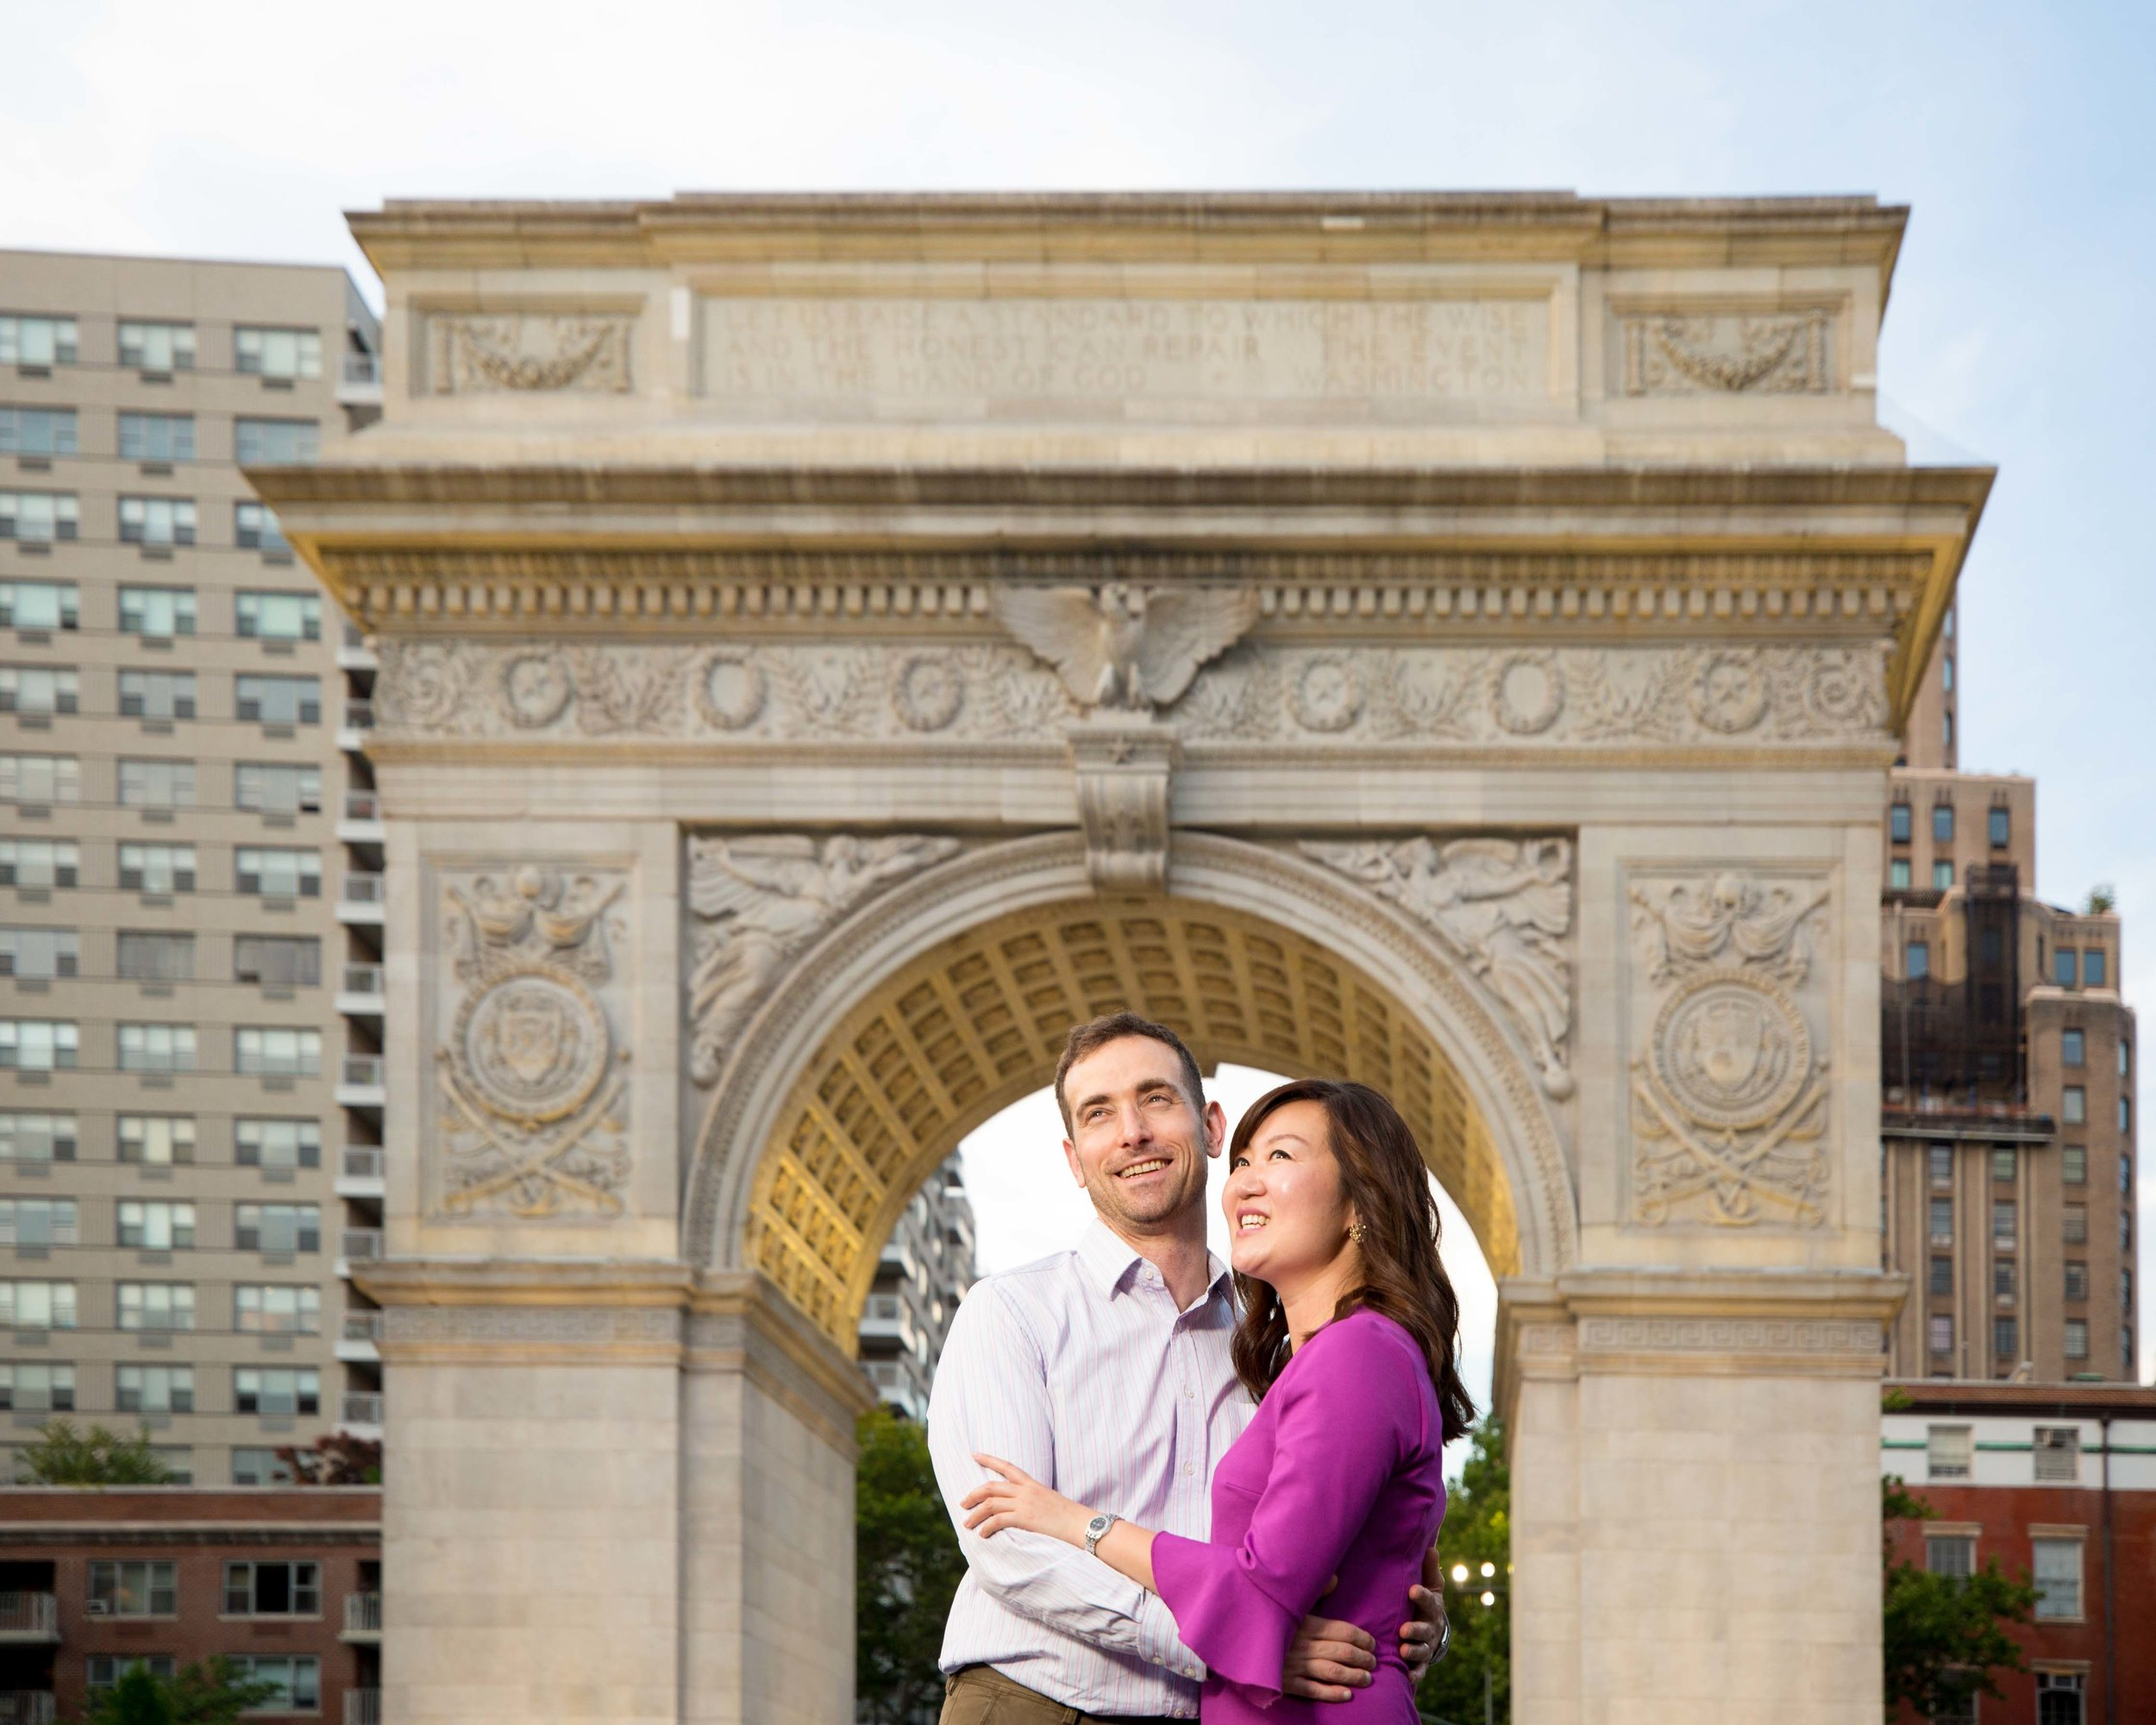 West Village Washington Square Park NYC Marriage Engagement Photo Session Shoot-11.jpg